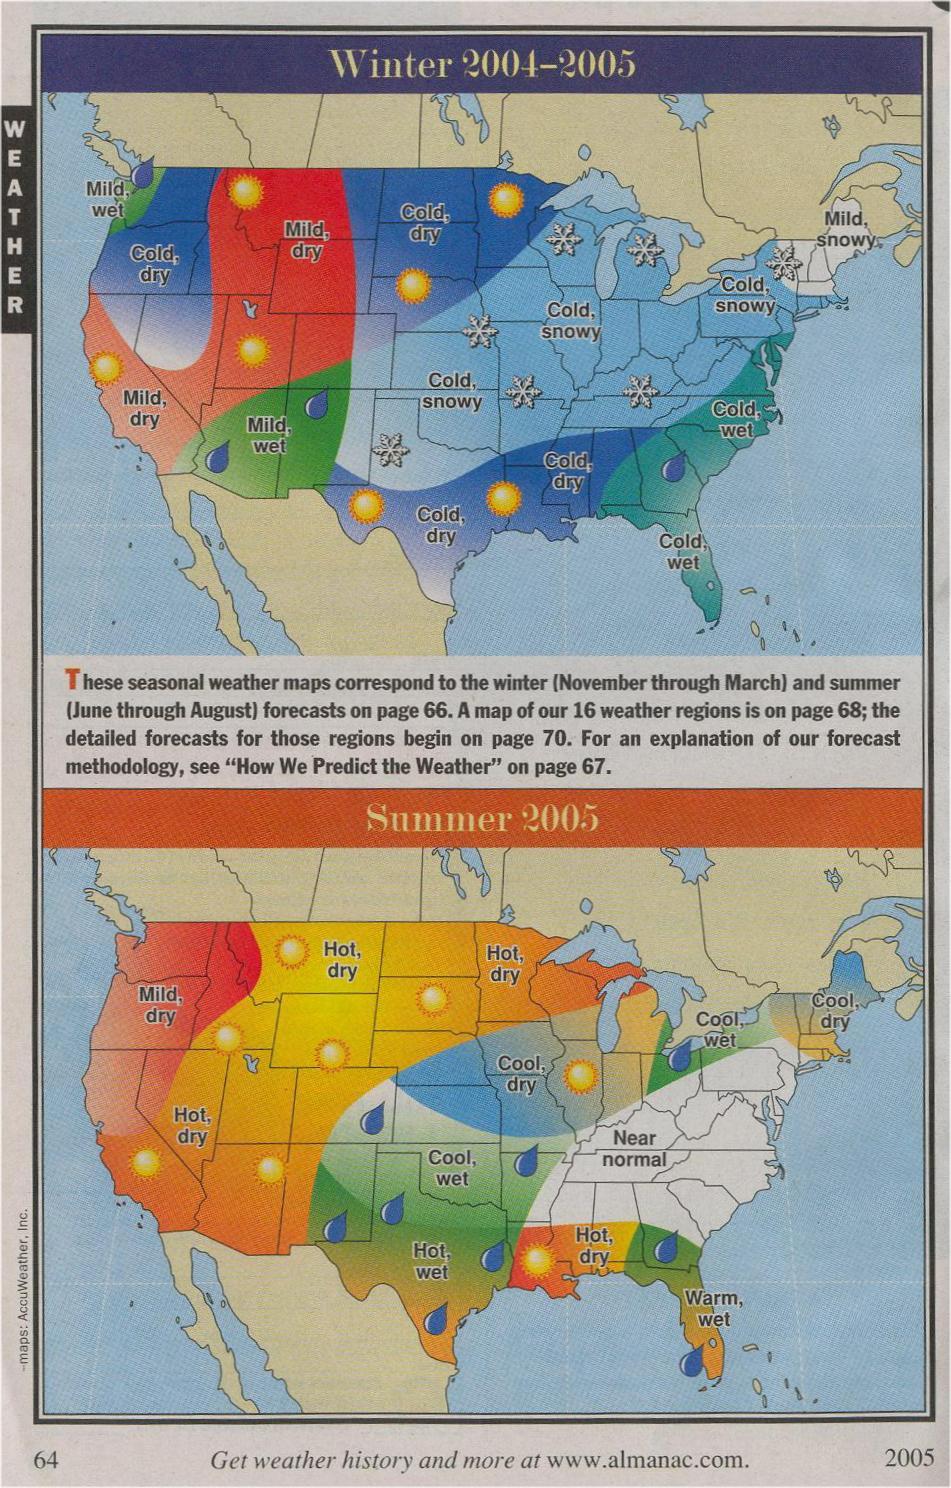 Old Farmers Almanac Weather Verification 2004-2005